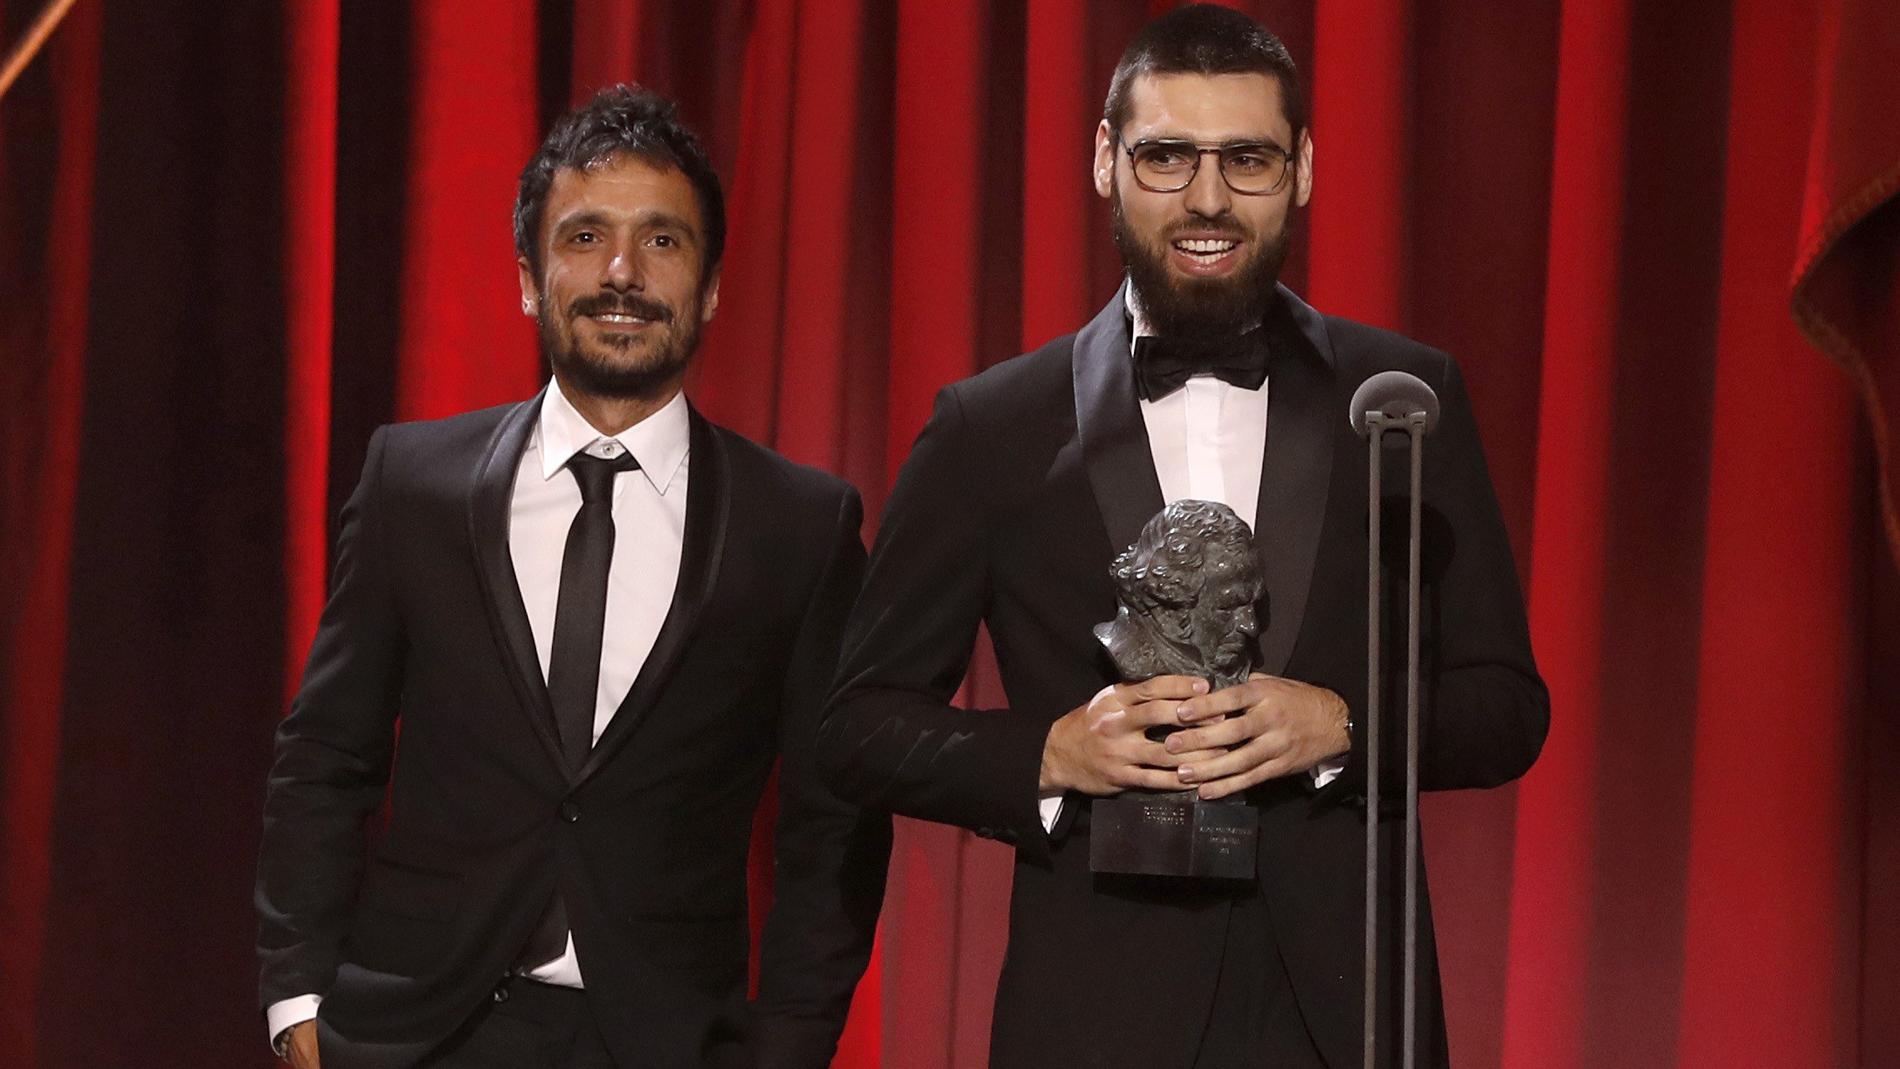 'Gaza' gana el premio al mejor cortometraje documental